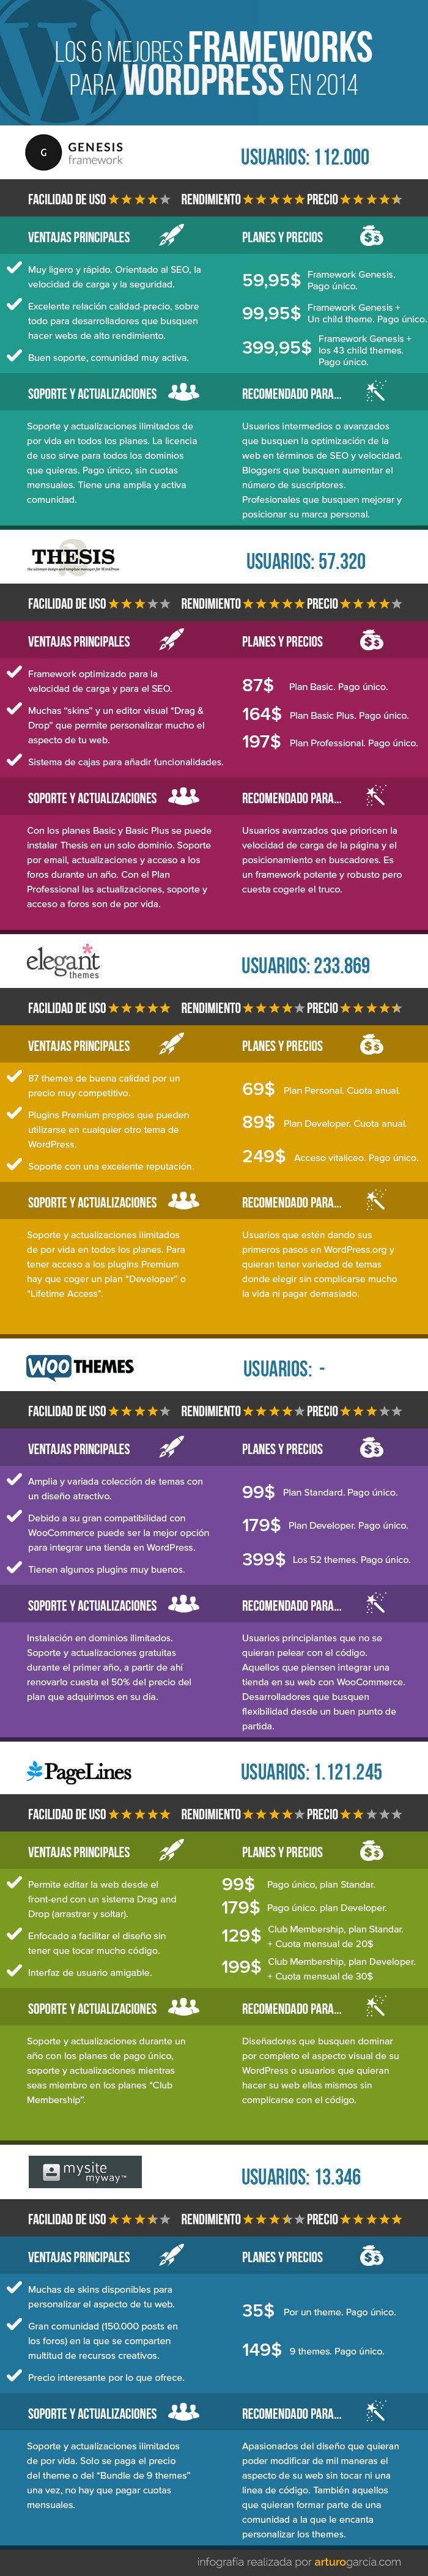 #Infografia #DisenoWeb ¿Cuál es el mejor framework para WordPress? #TAVnews